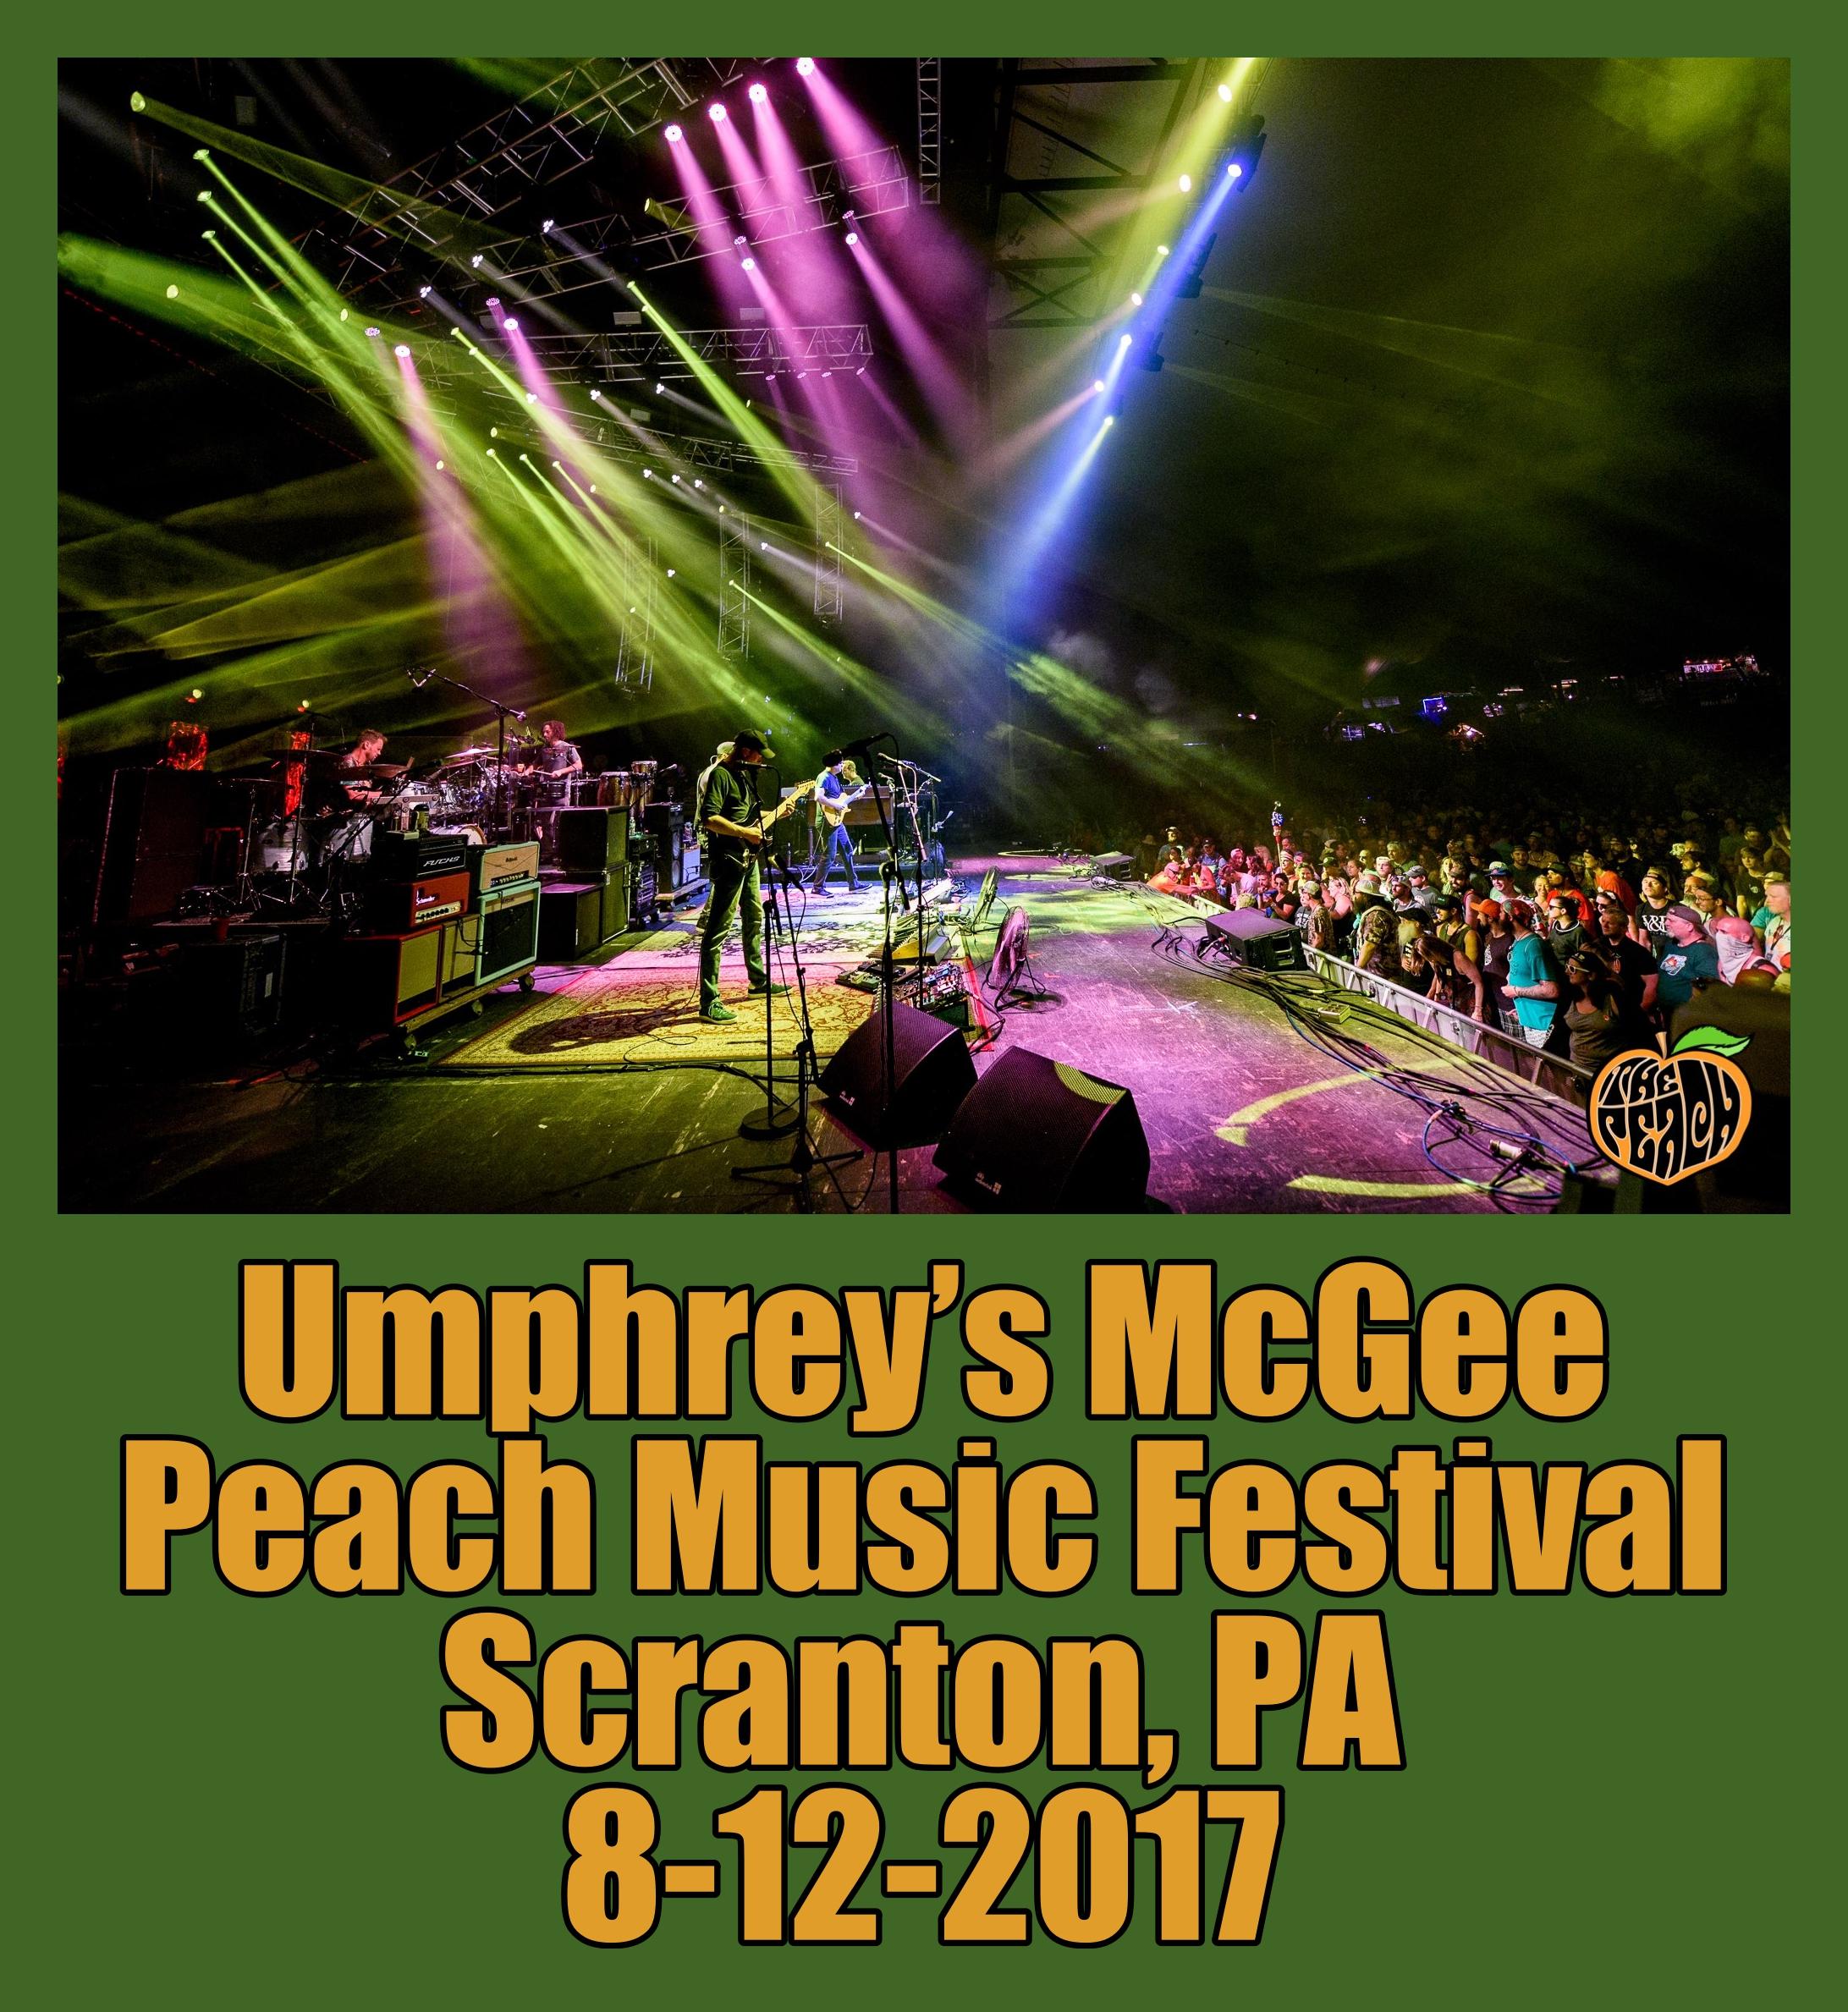 UmphreysMcGee2017-08-12MontageMountainPavillionScrantonPA.jpg